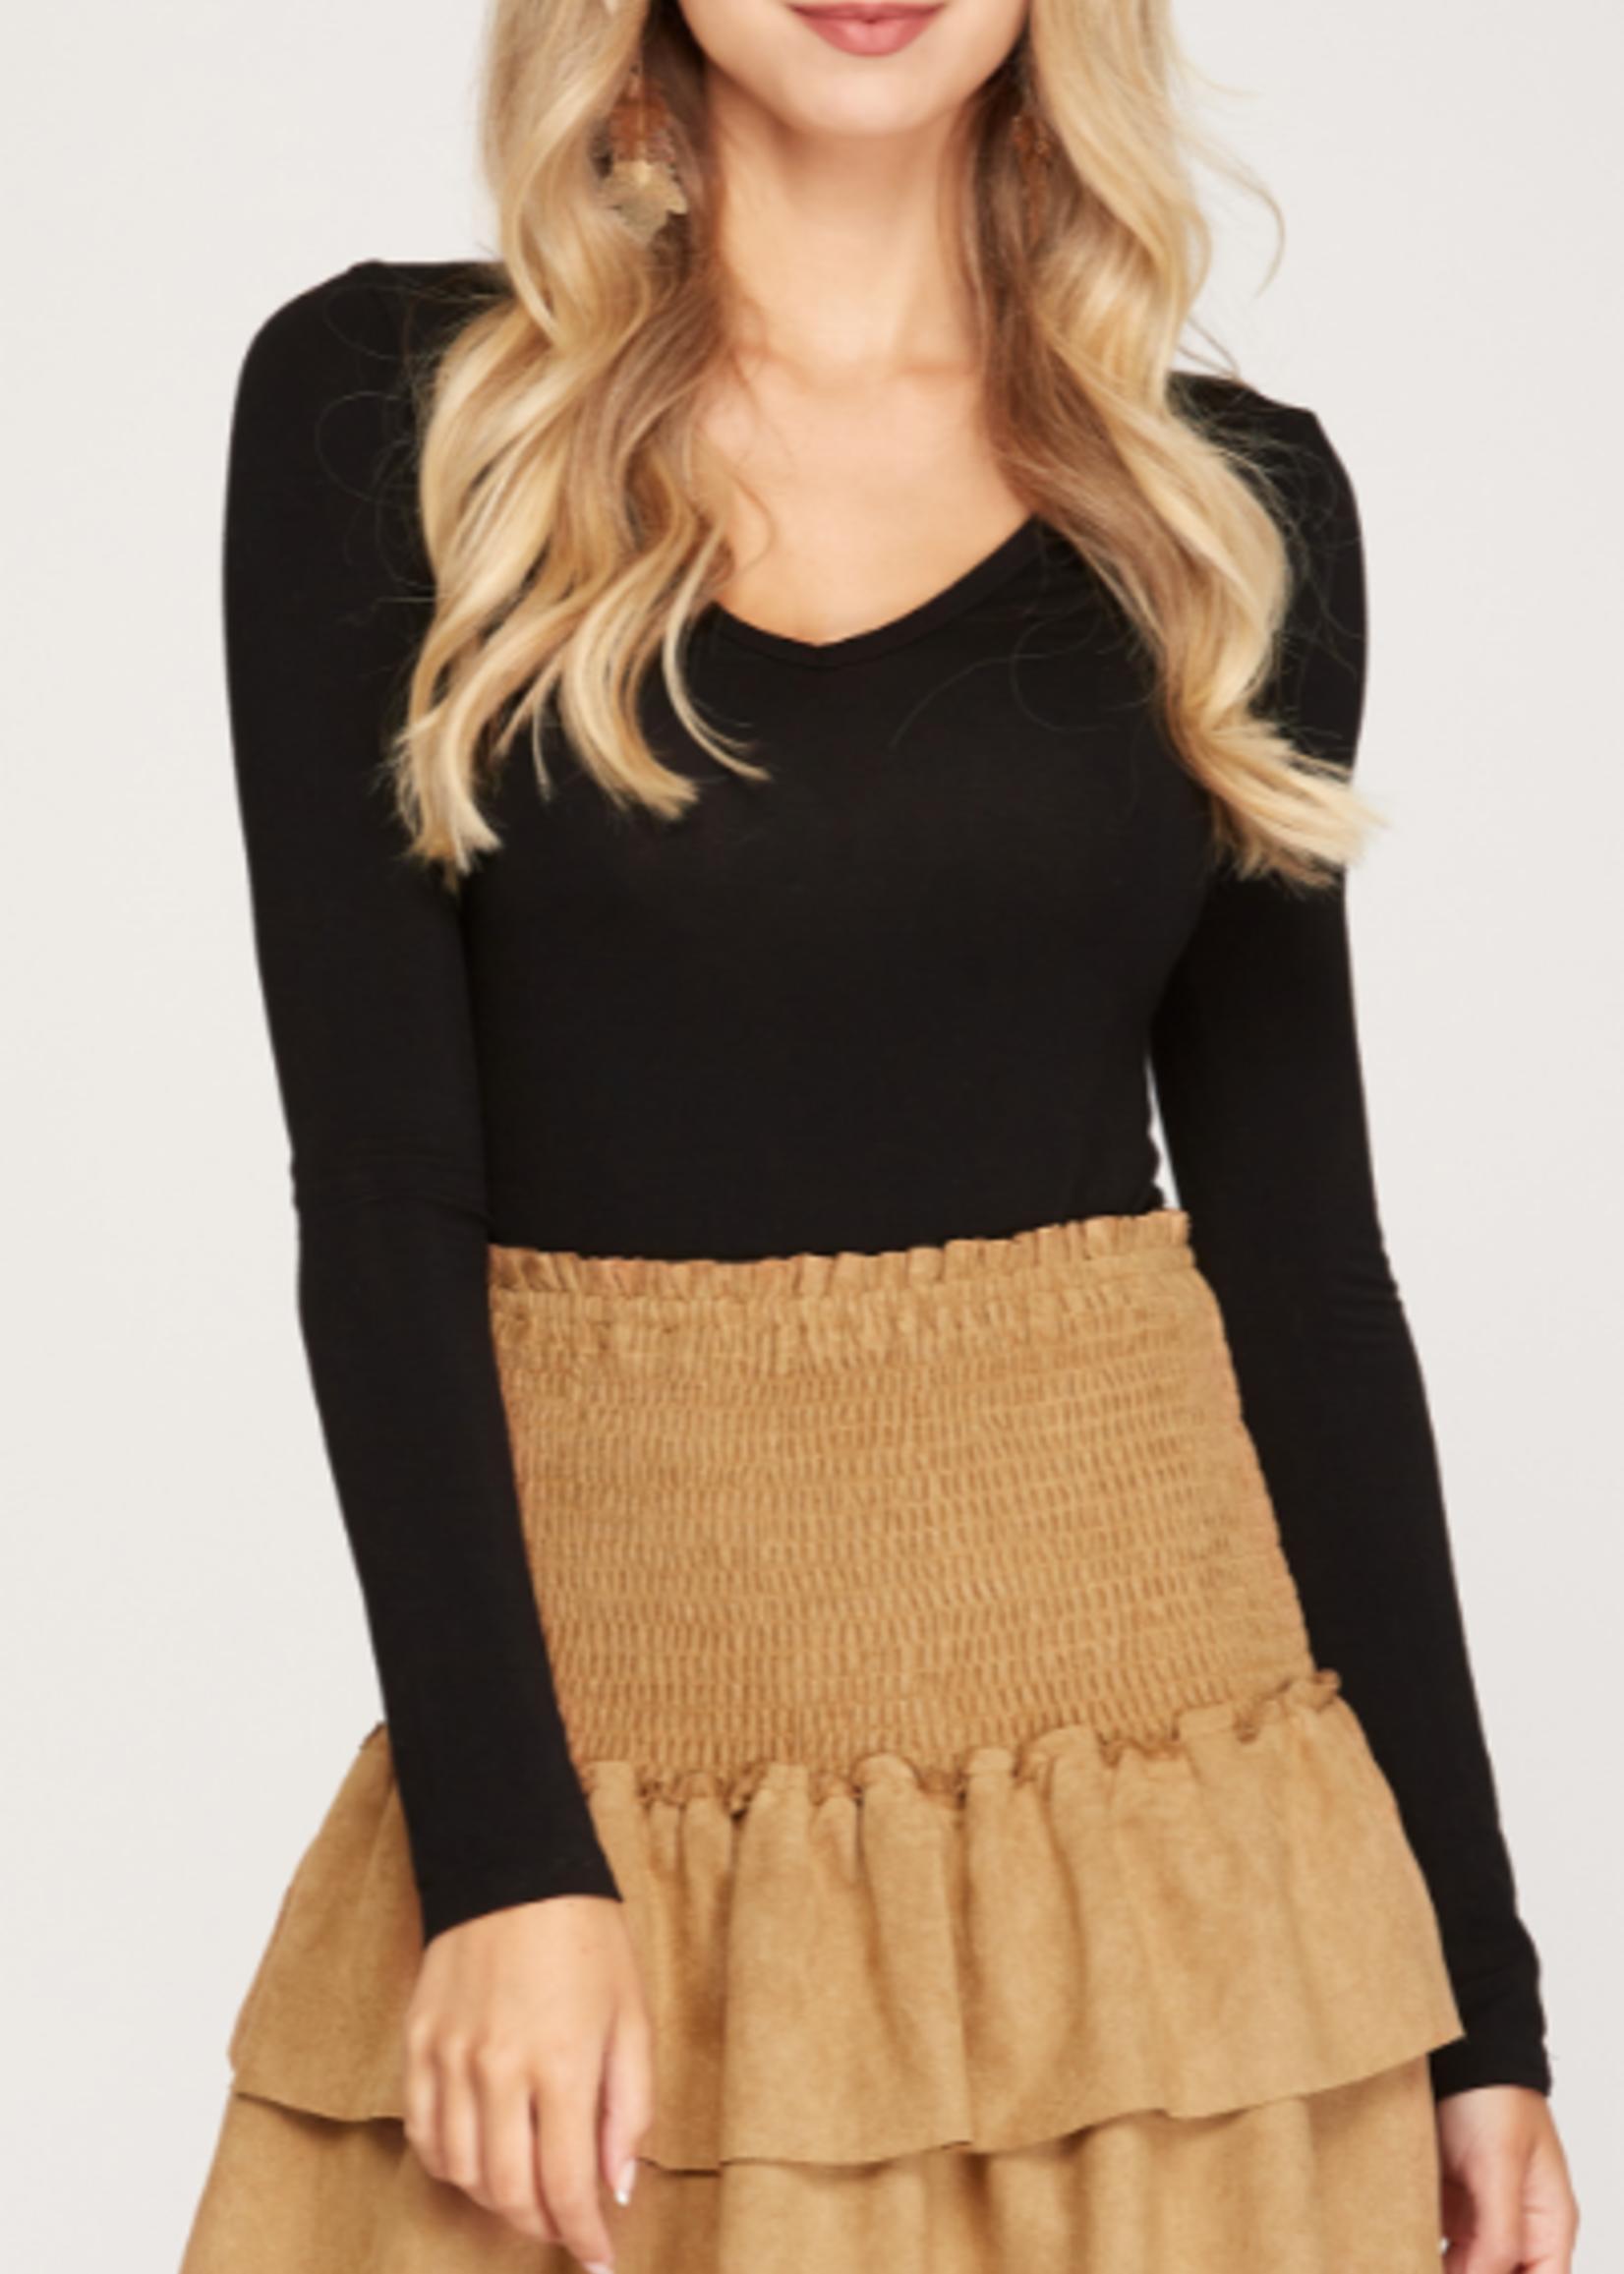 Cute In Camel Suede Skirt